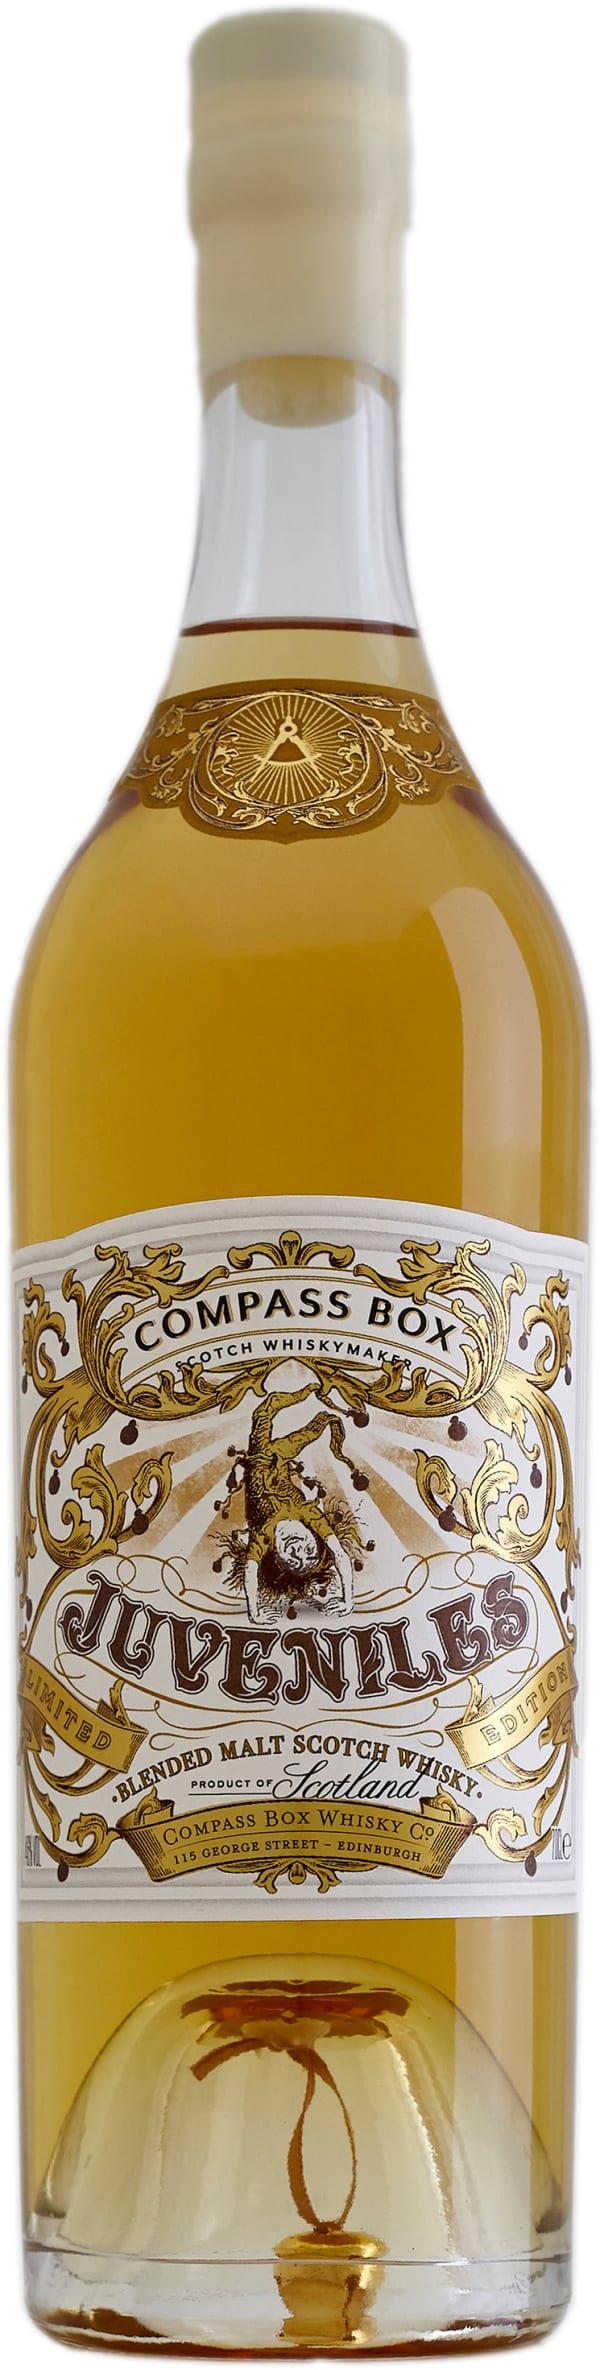 Compass Box Juveniles Blended Malt